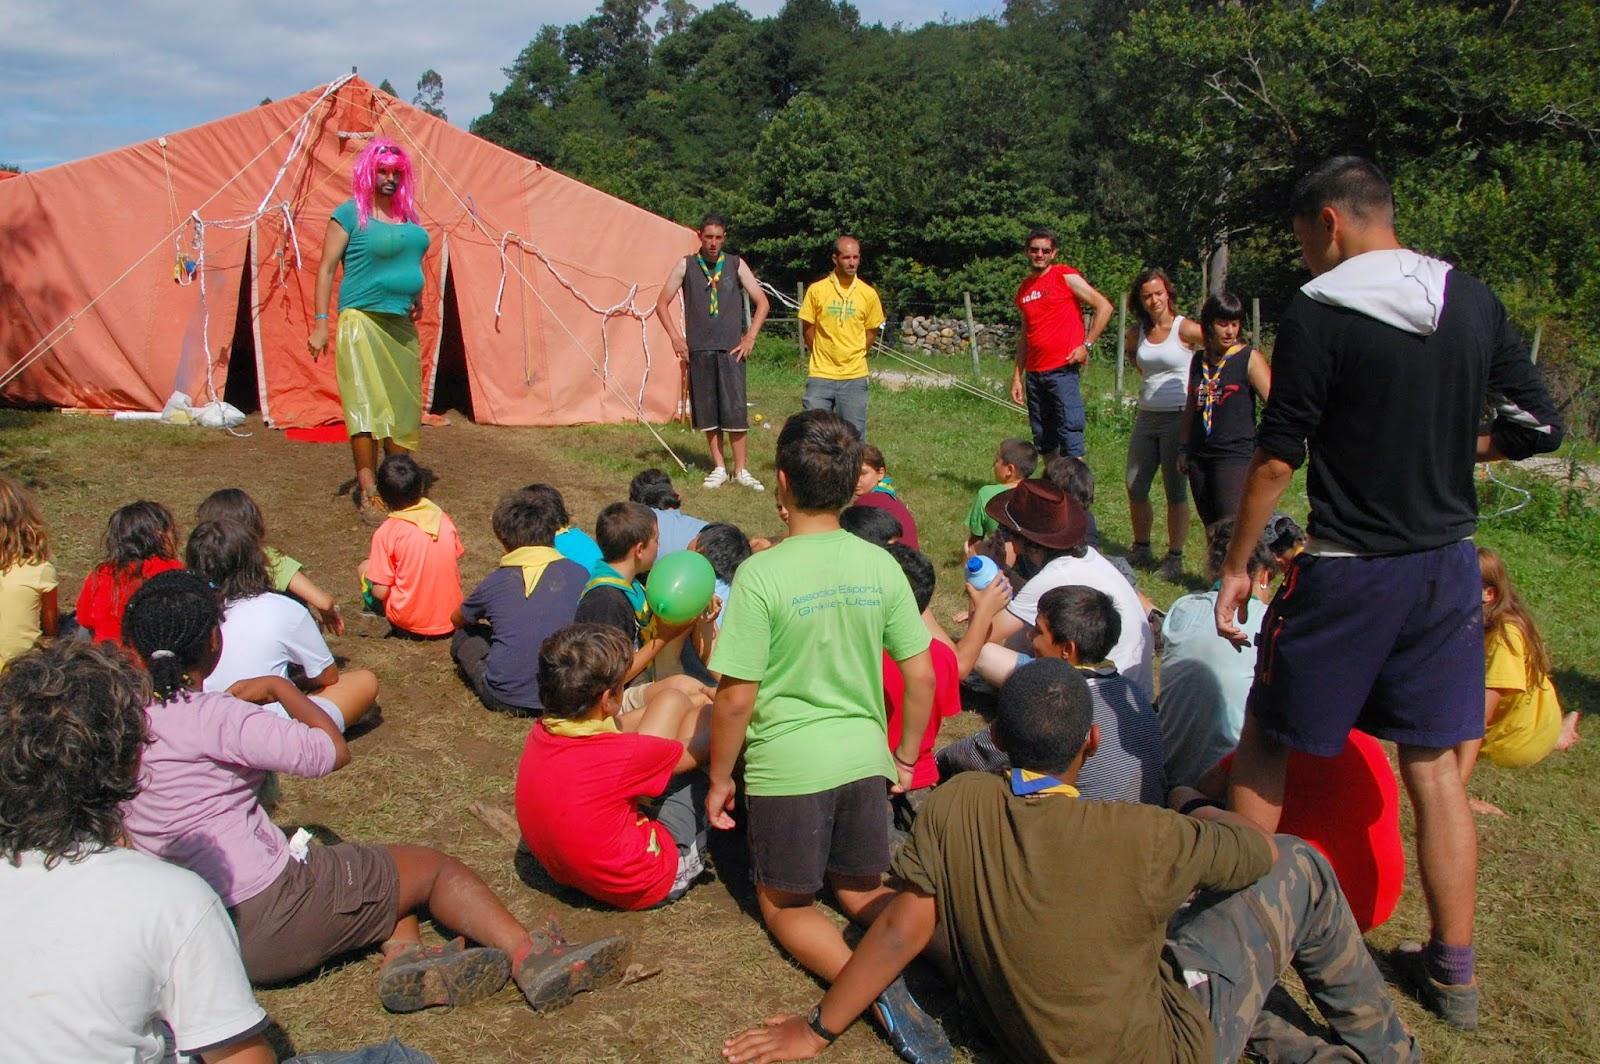 Campaments Estiu RolandKing 2011 - DSC_0170.JPG